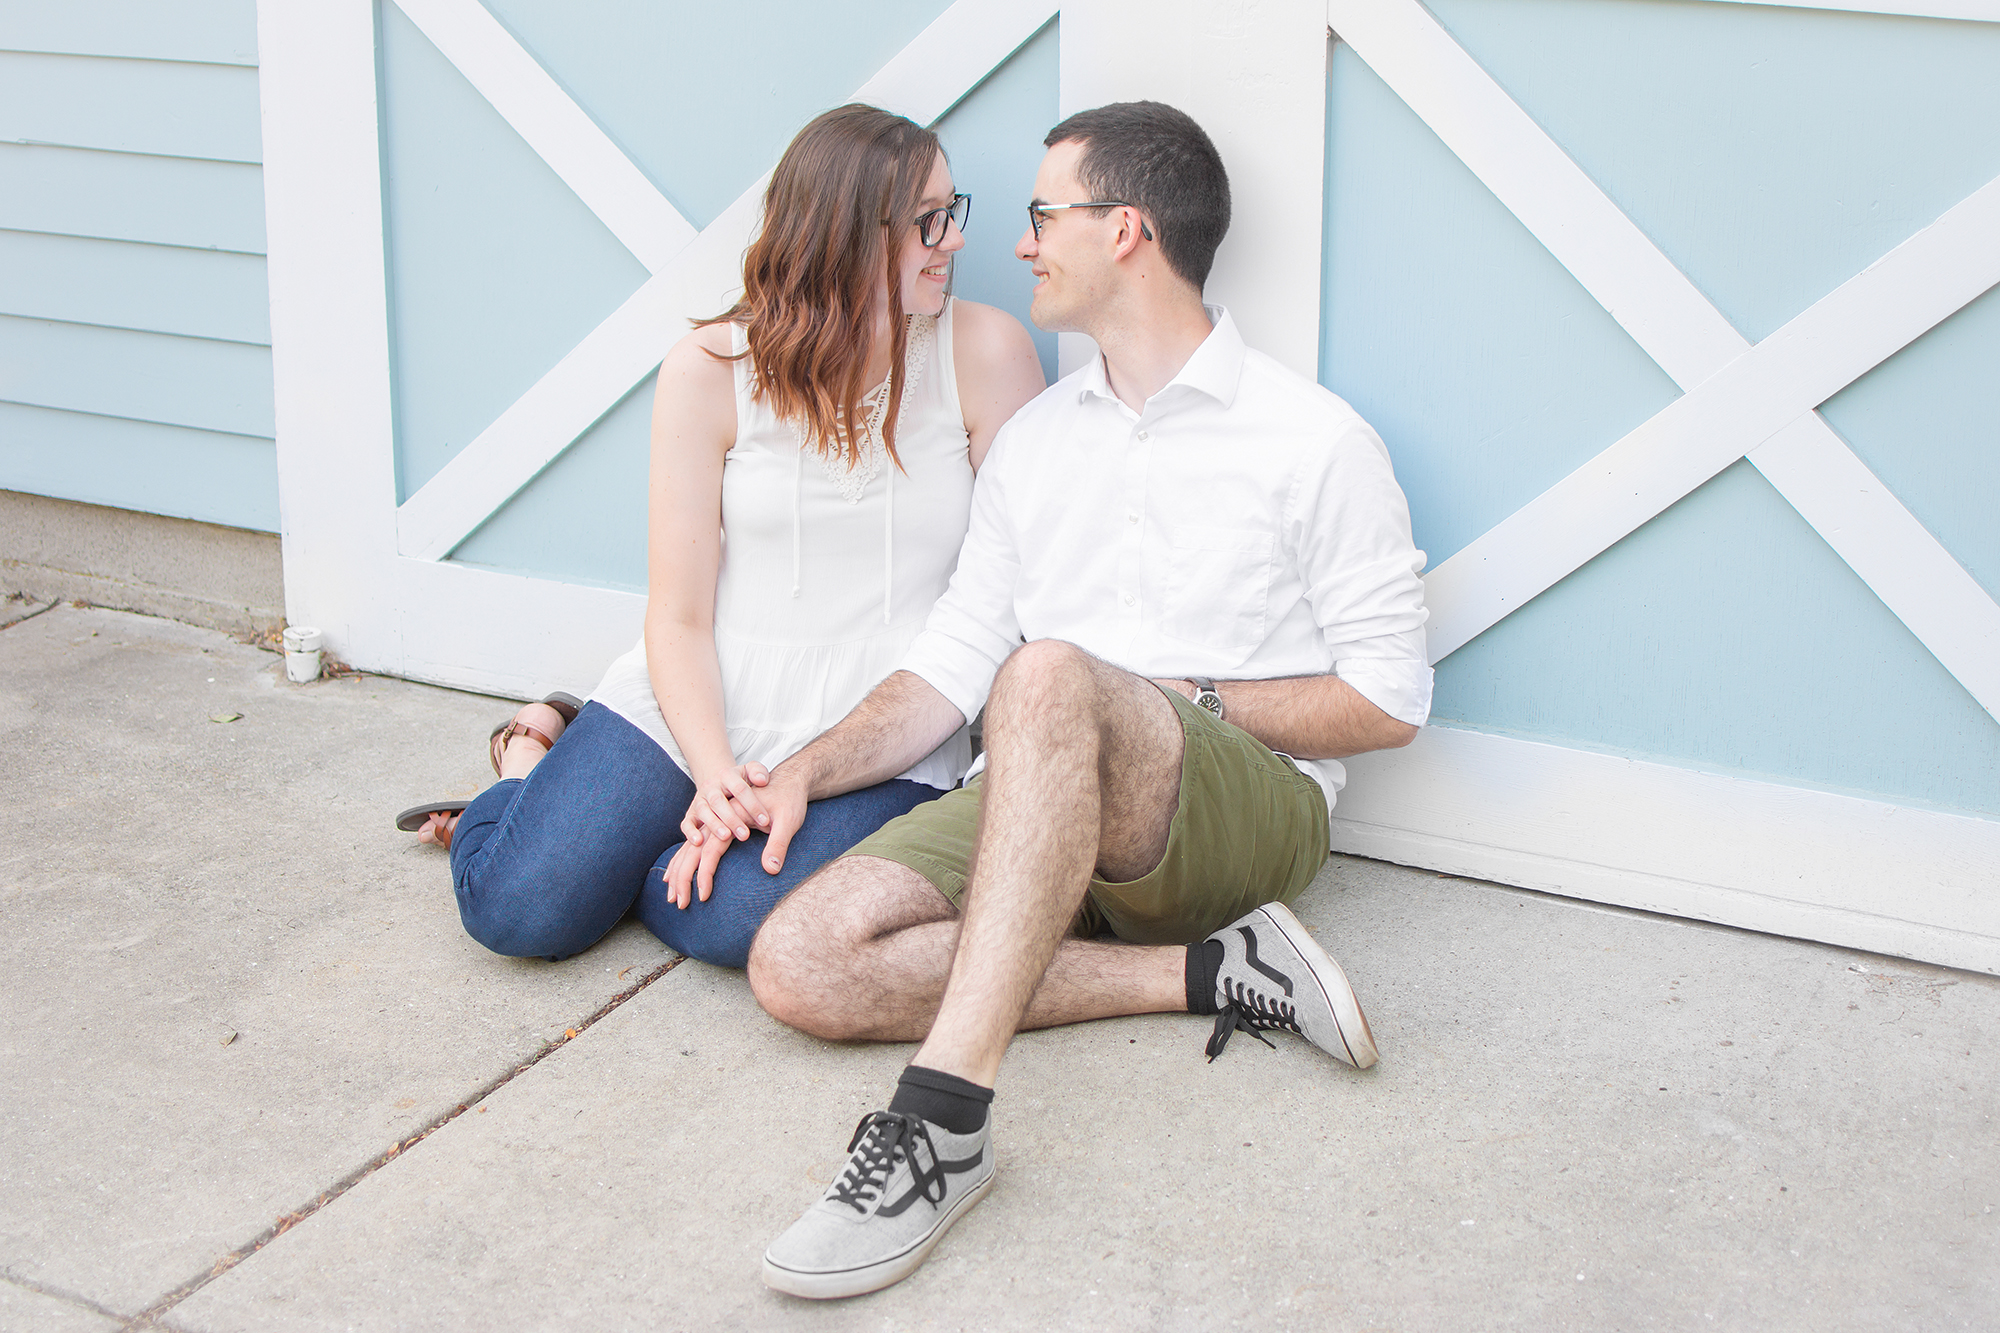 Lindsay-Adkins-Photography-Michigan-Wedding-Photographer-Becca-Ben-Blog-4